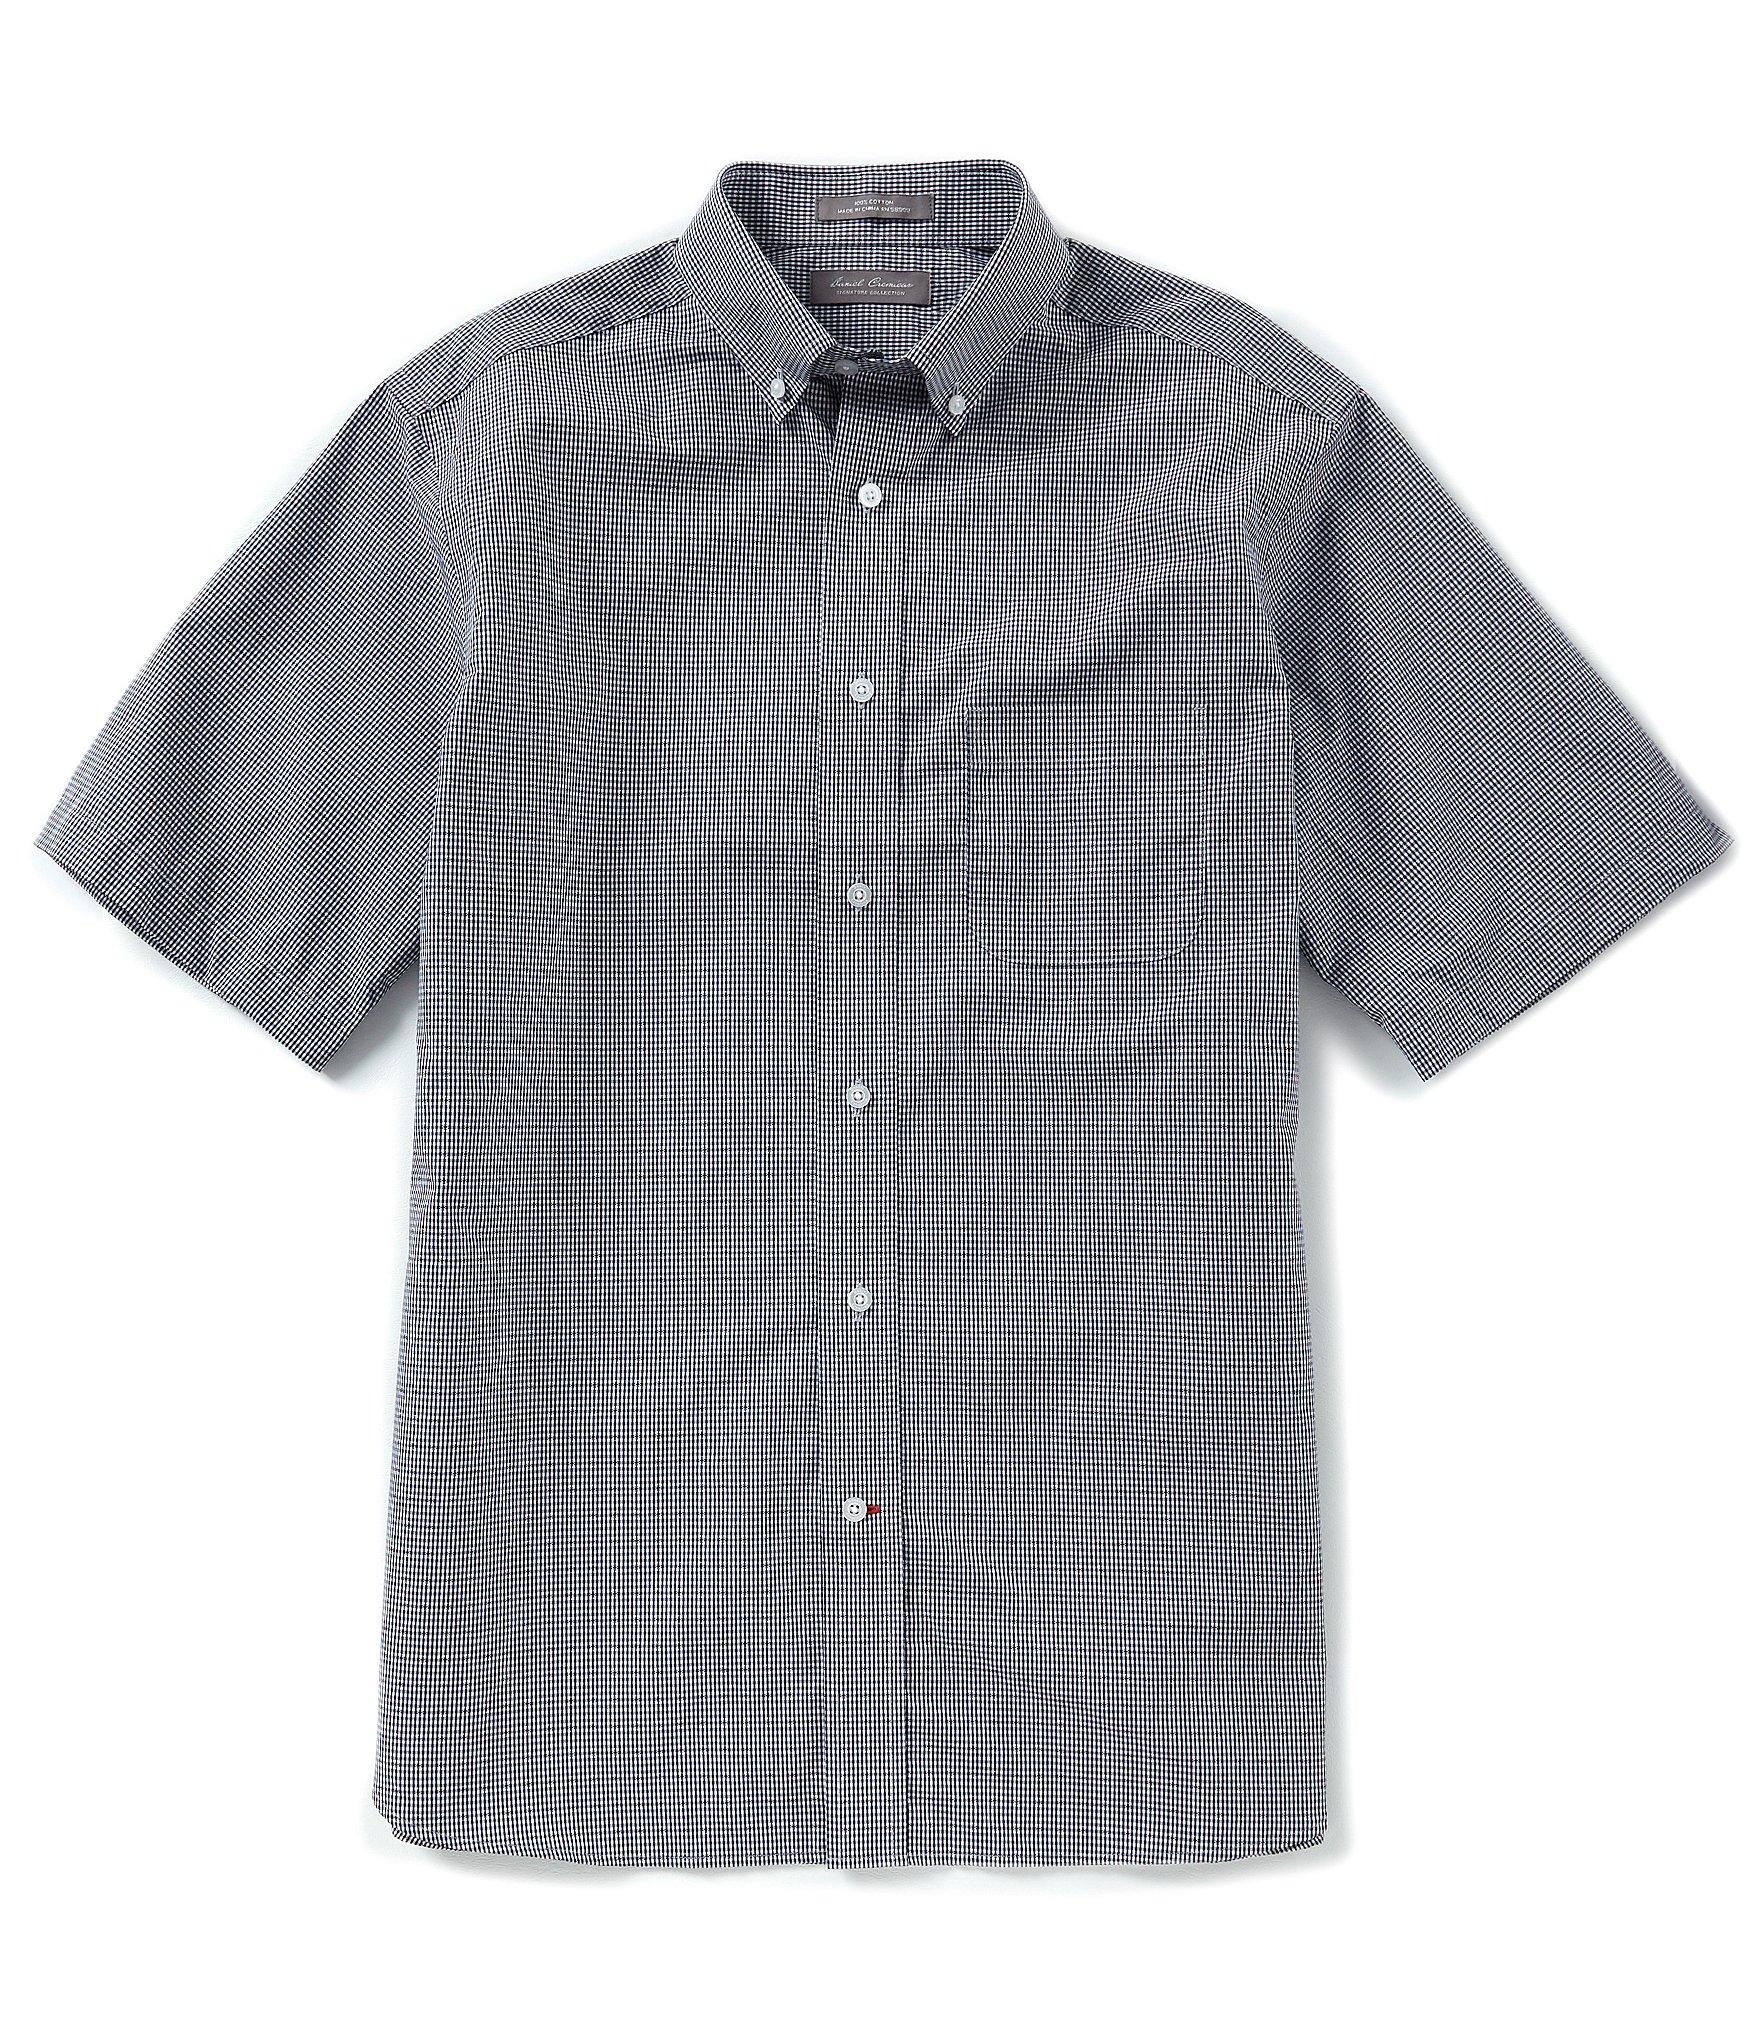 81233852 Men's Shirts   Dillard's